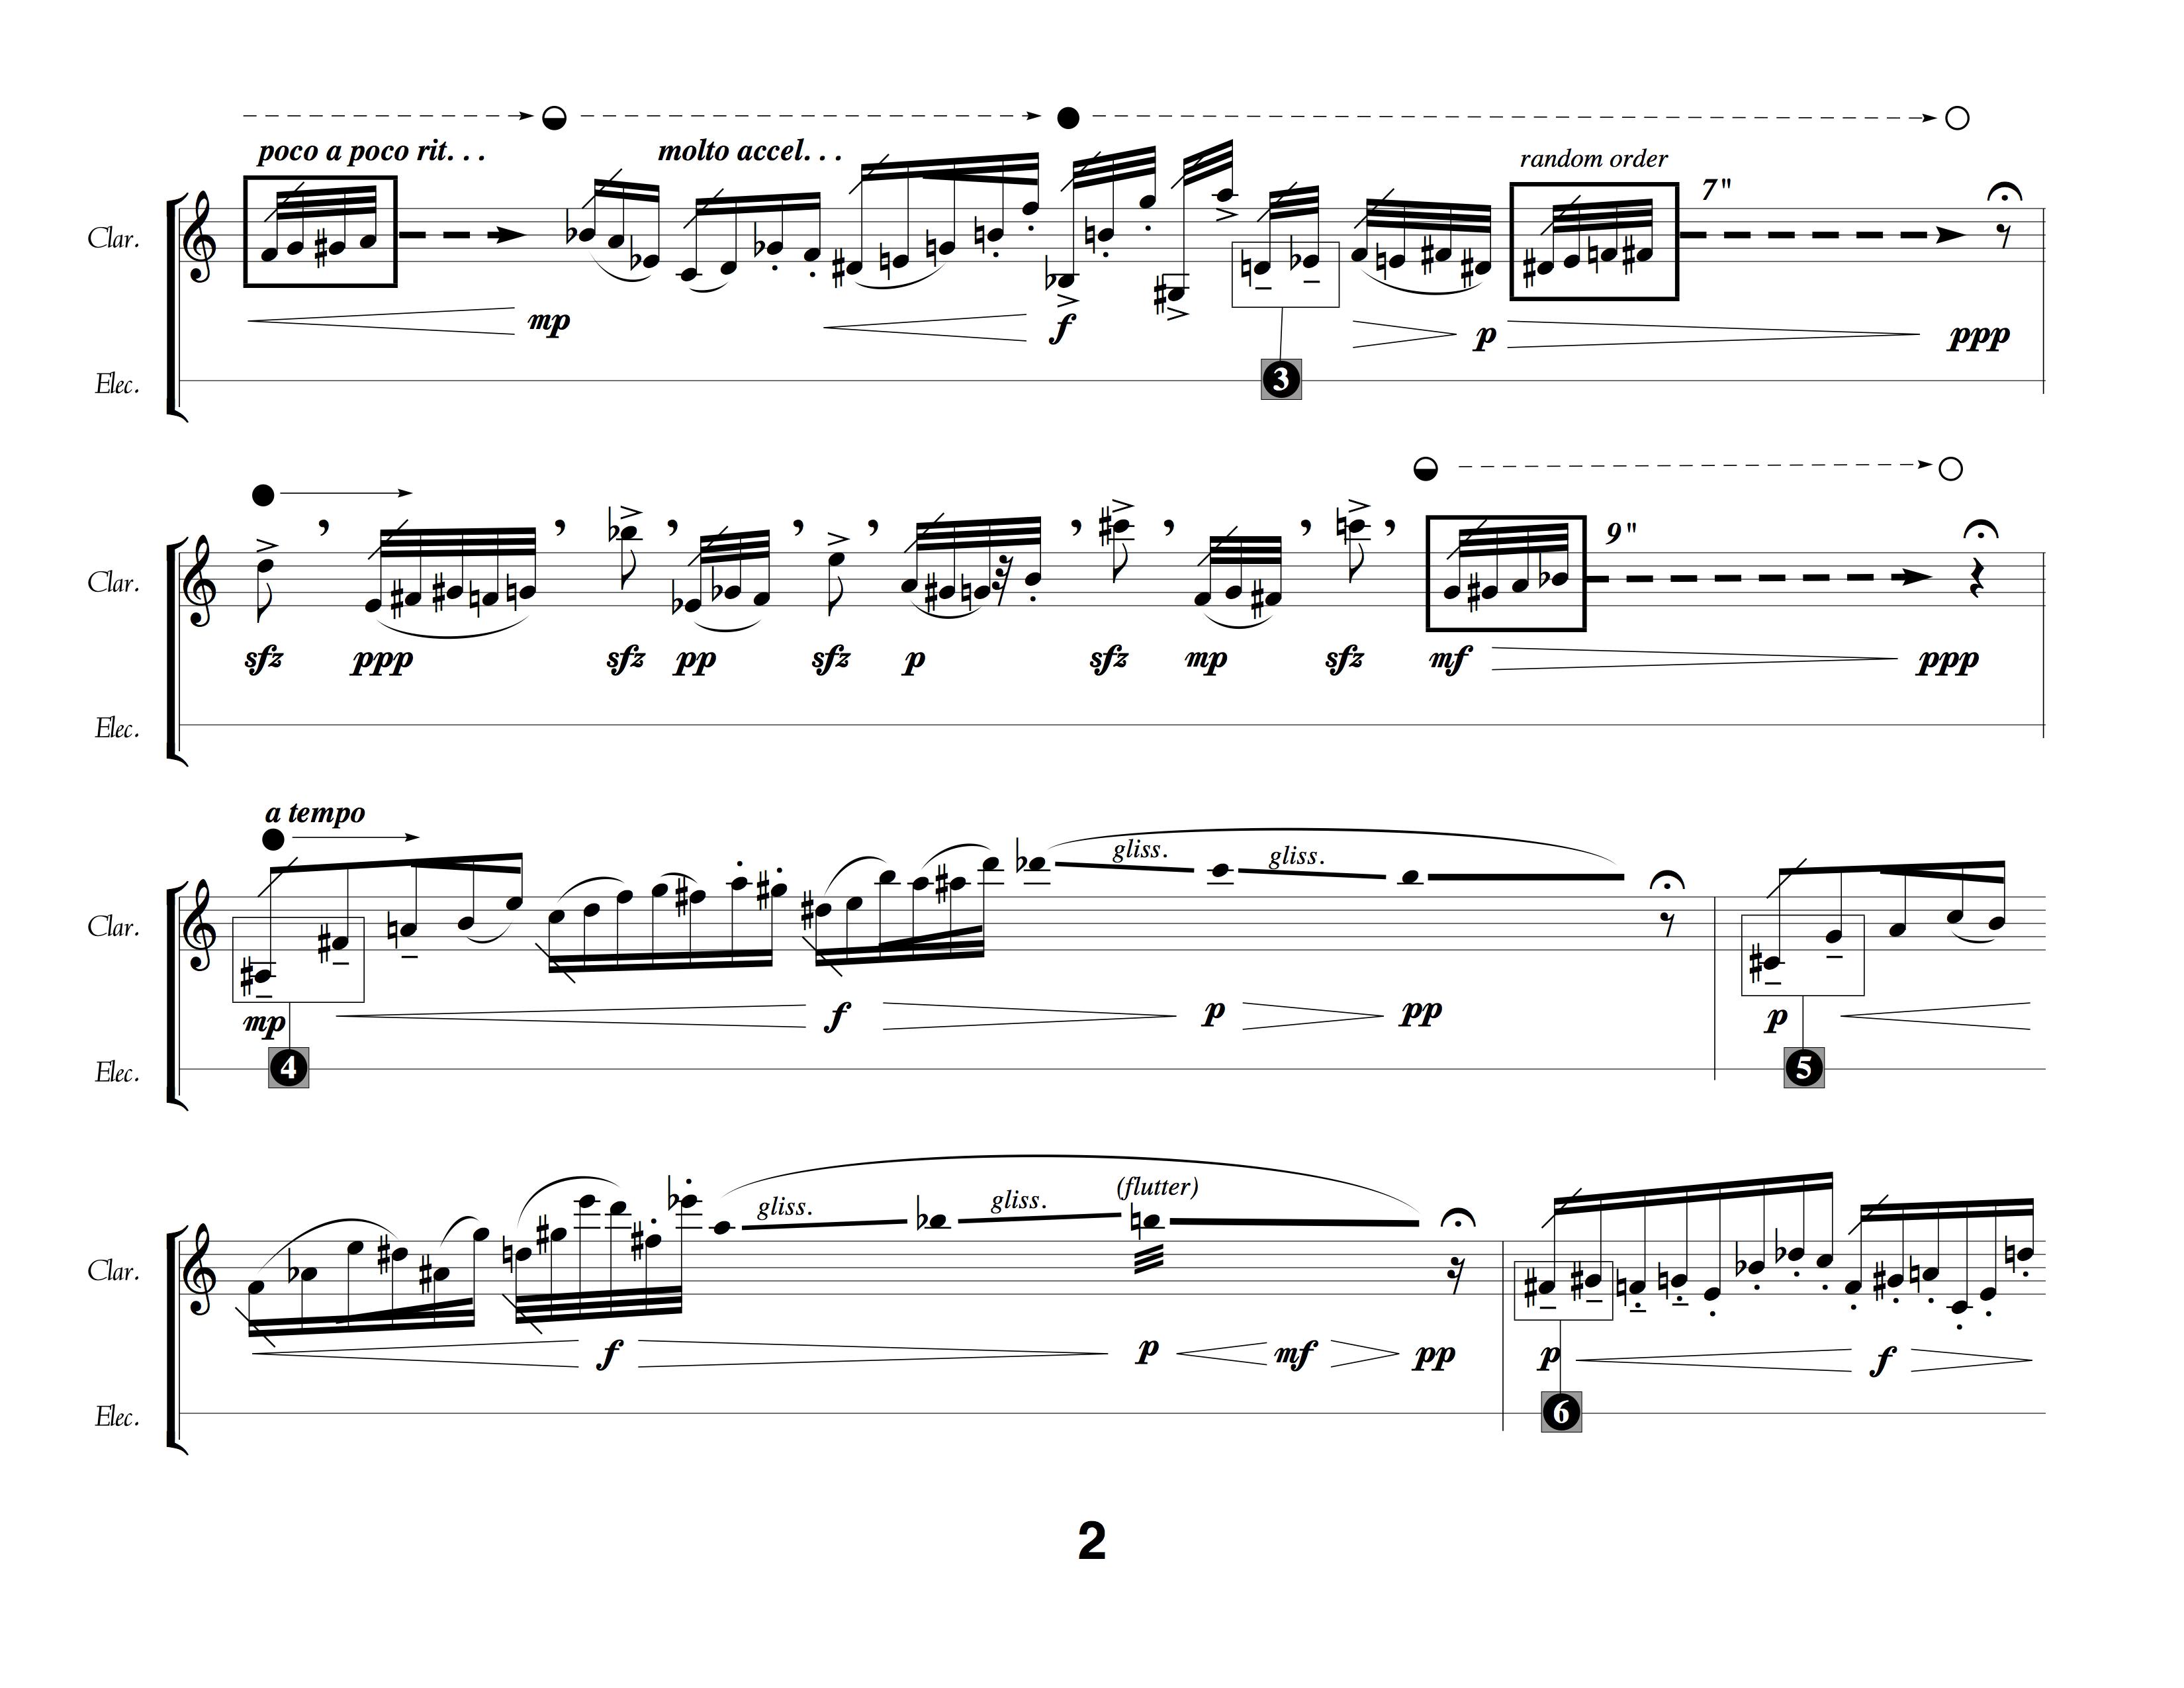 Output of avant garde notation